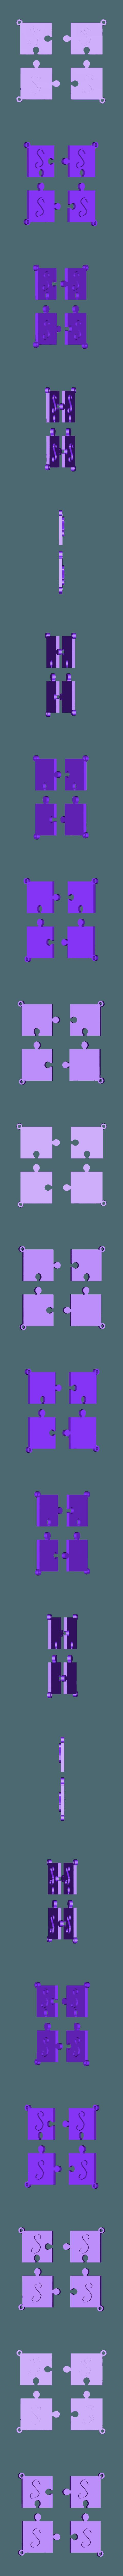 puzzle s.stl Download STL file puzzle key ring • 3D printing design, catf3d